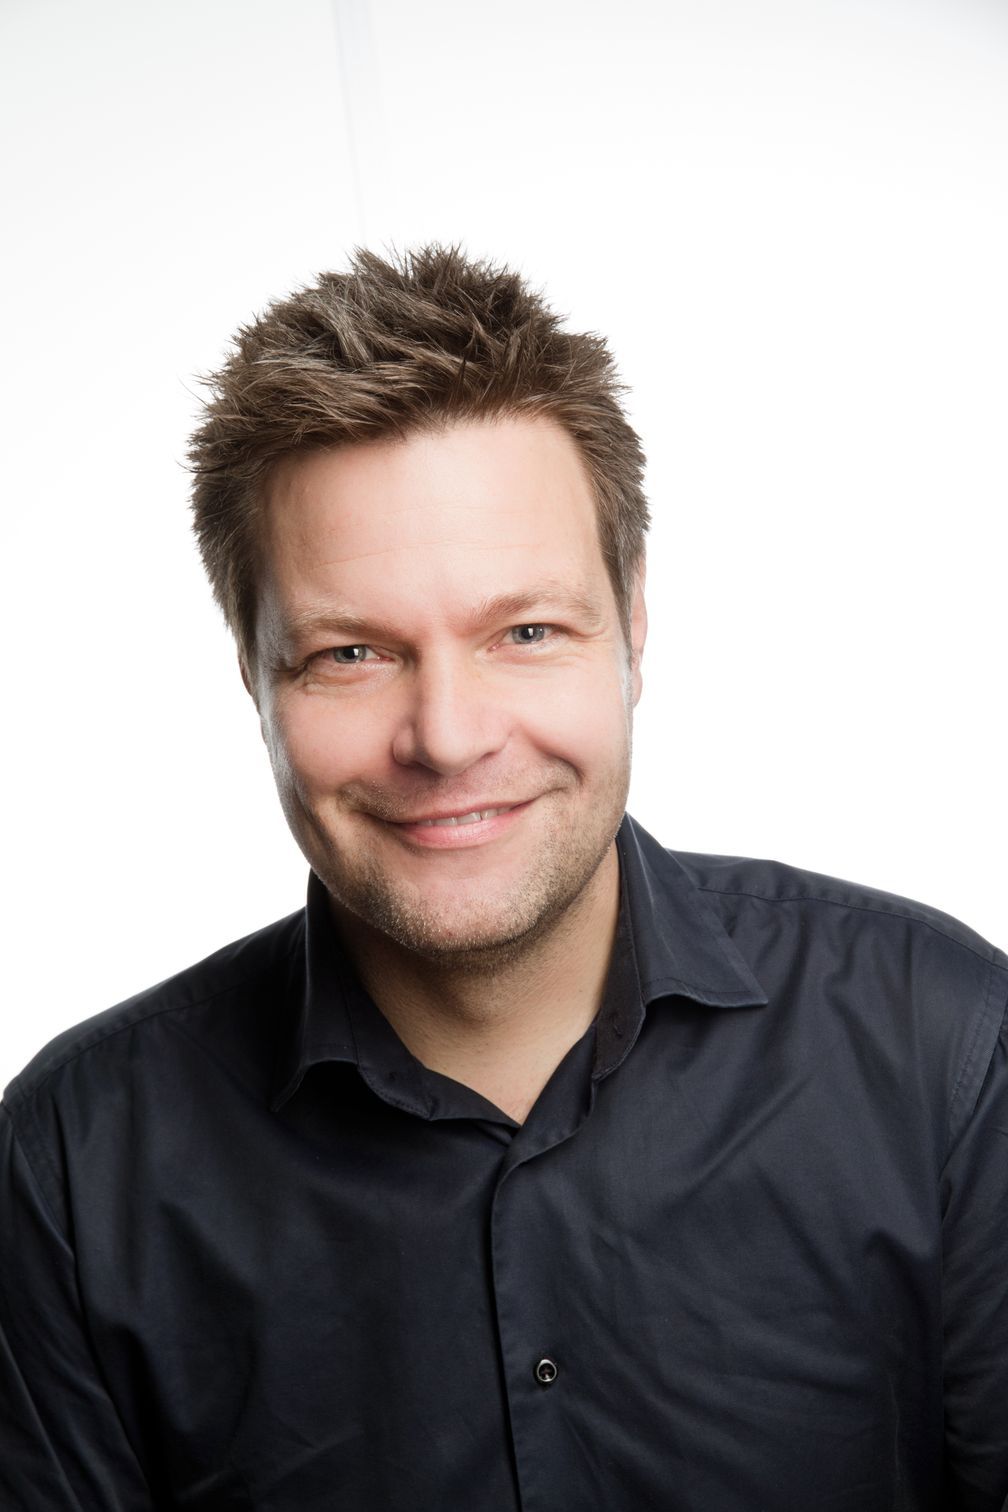 Robert Habeck (2012)